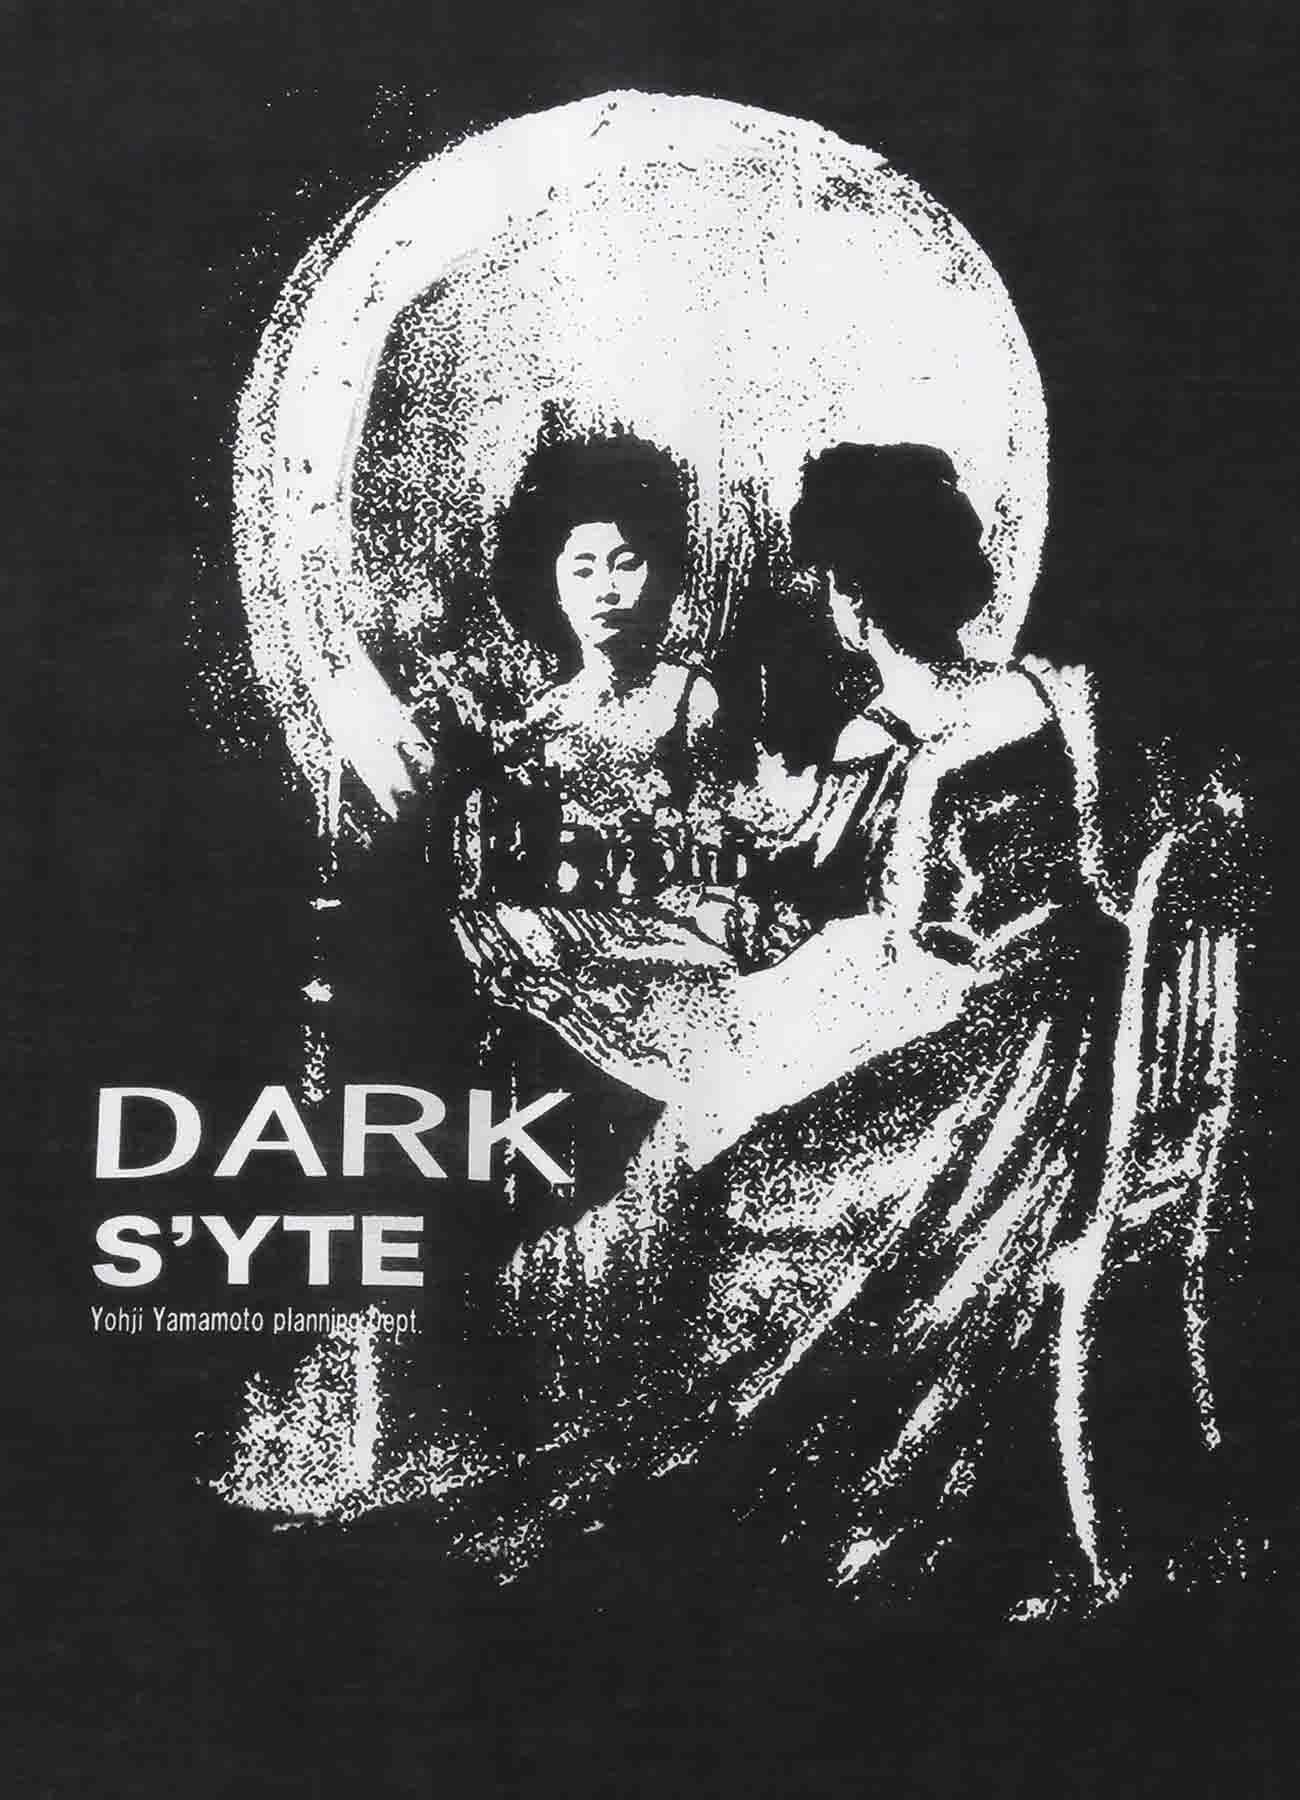 DarkS'YTE Fakea Bandana